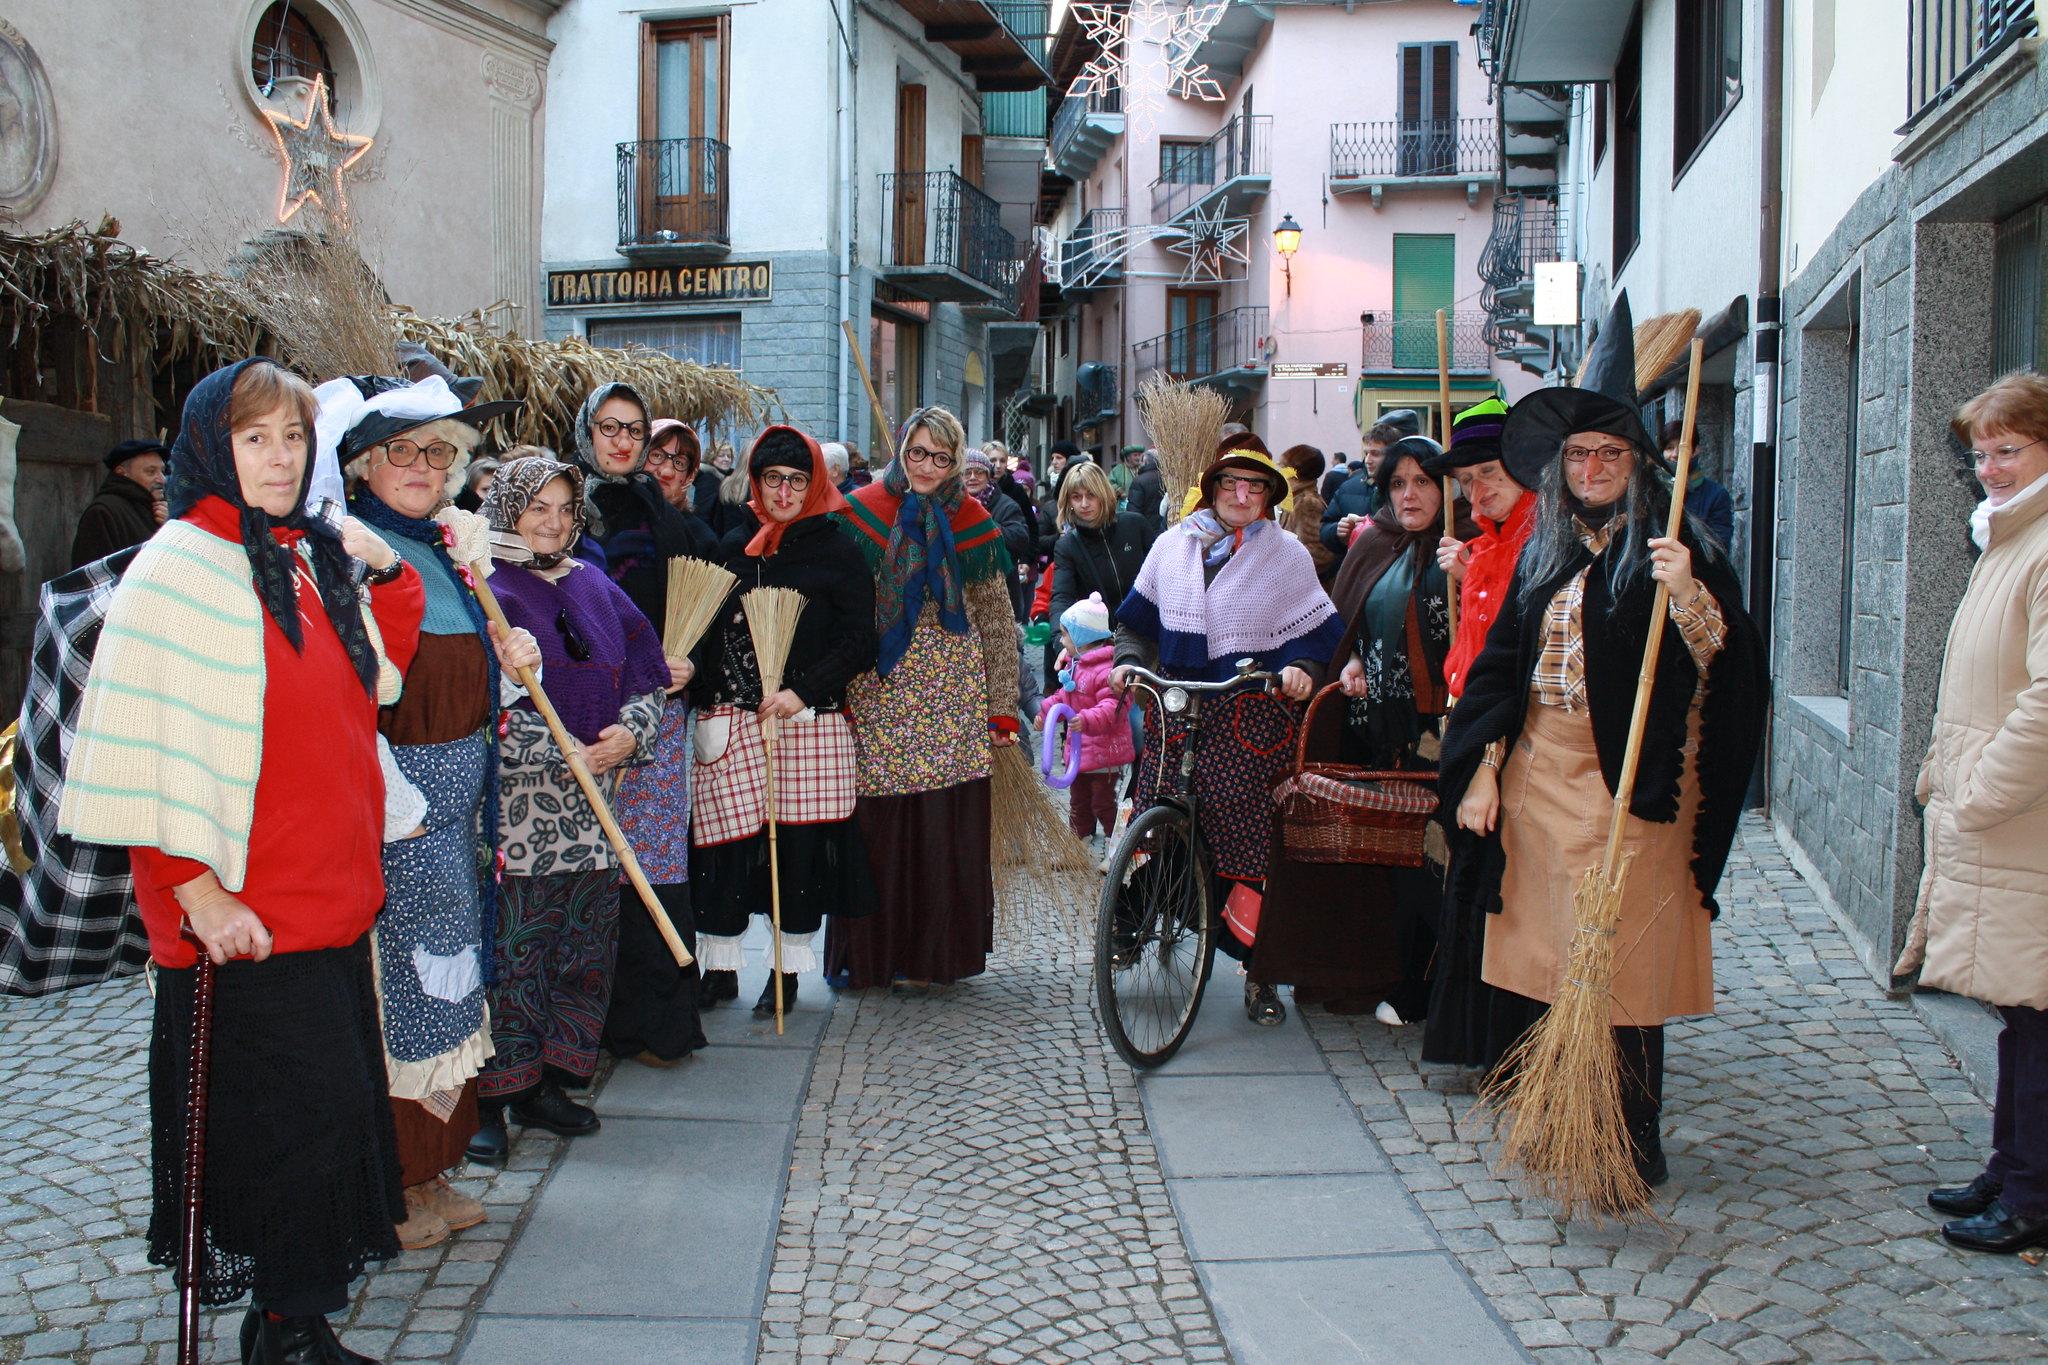 Italian ladies dressed up as La Befana